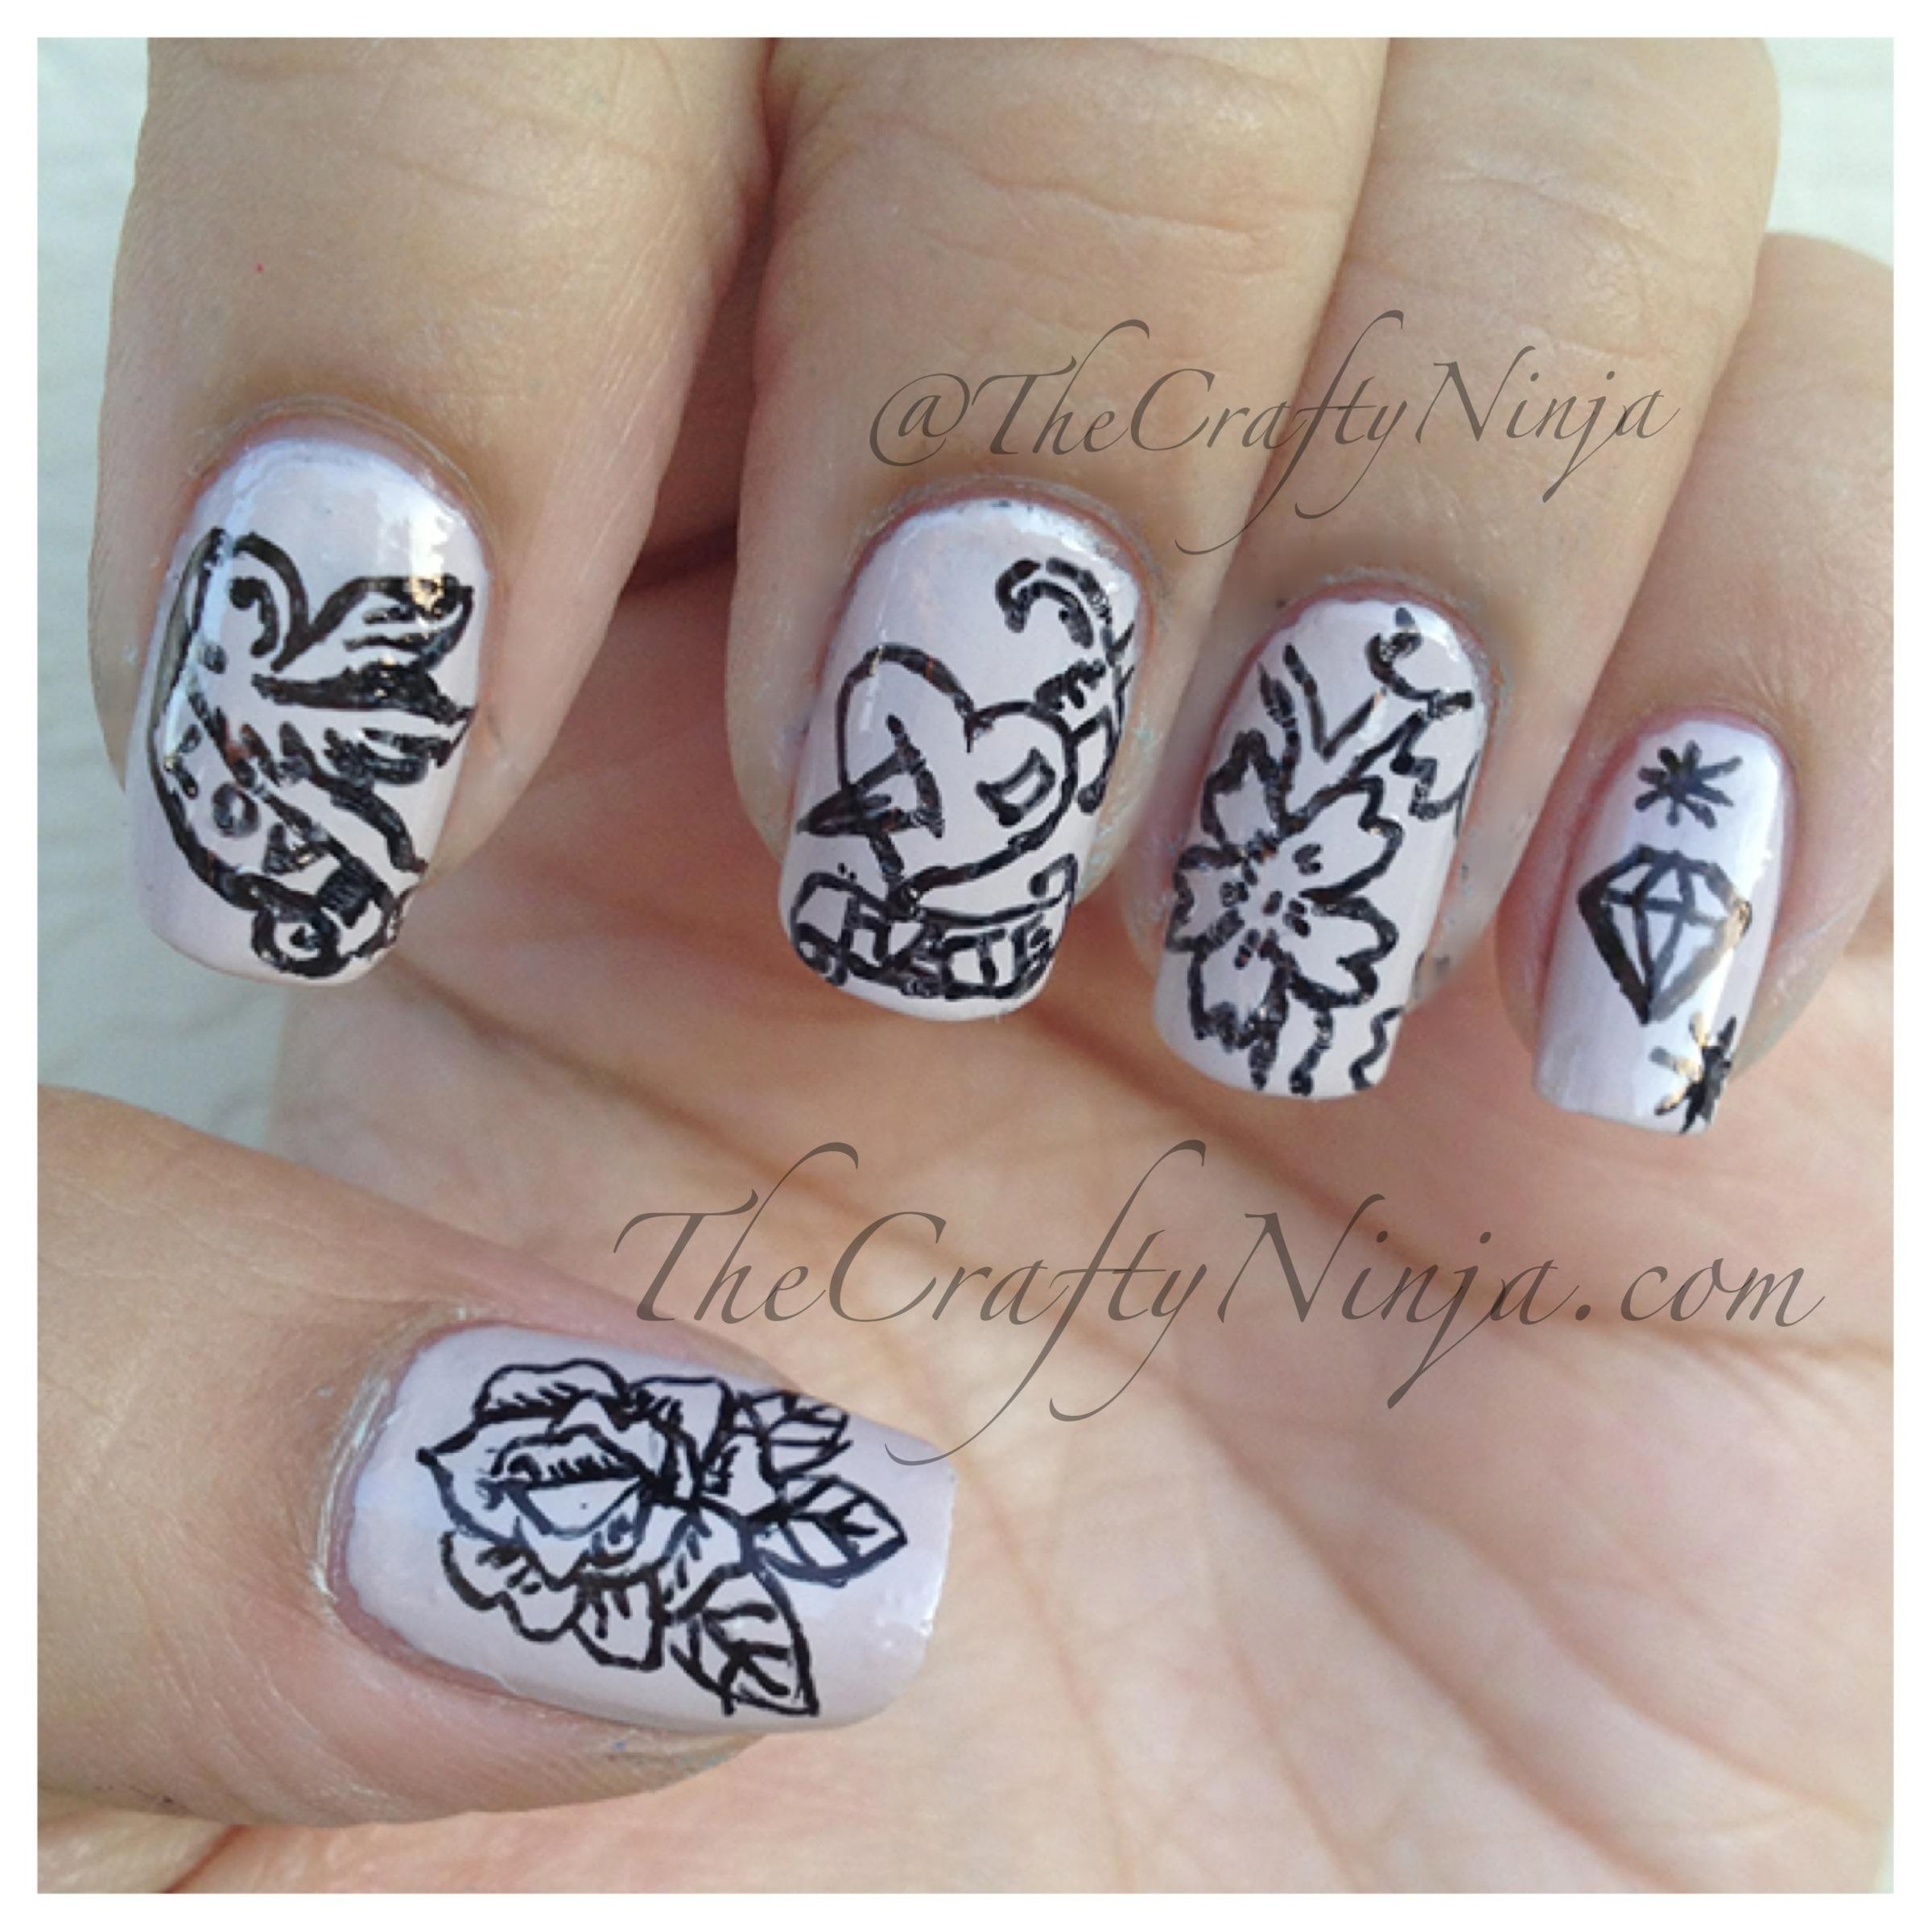 tattoo nail design crafty